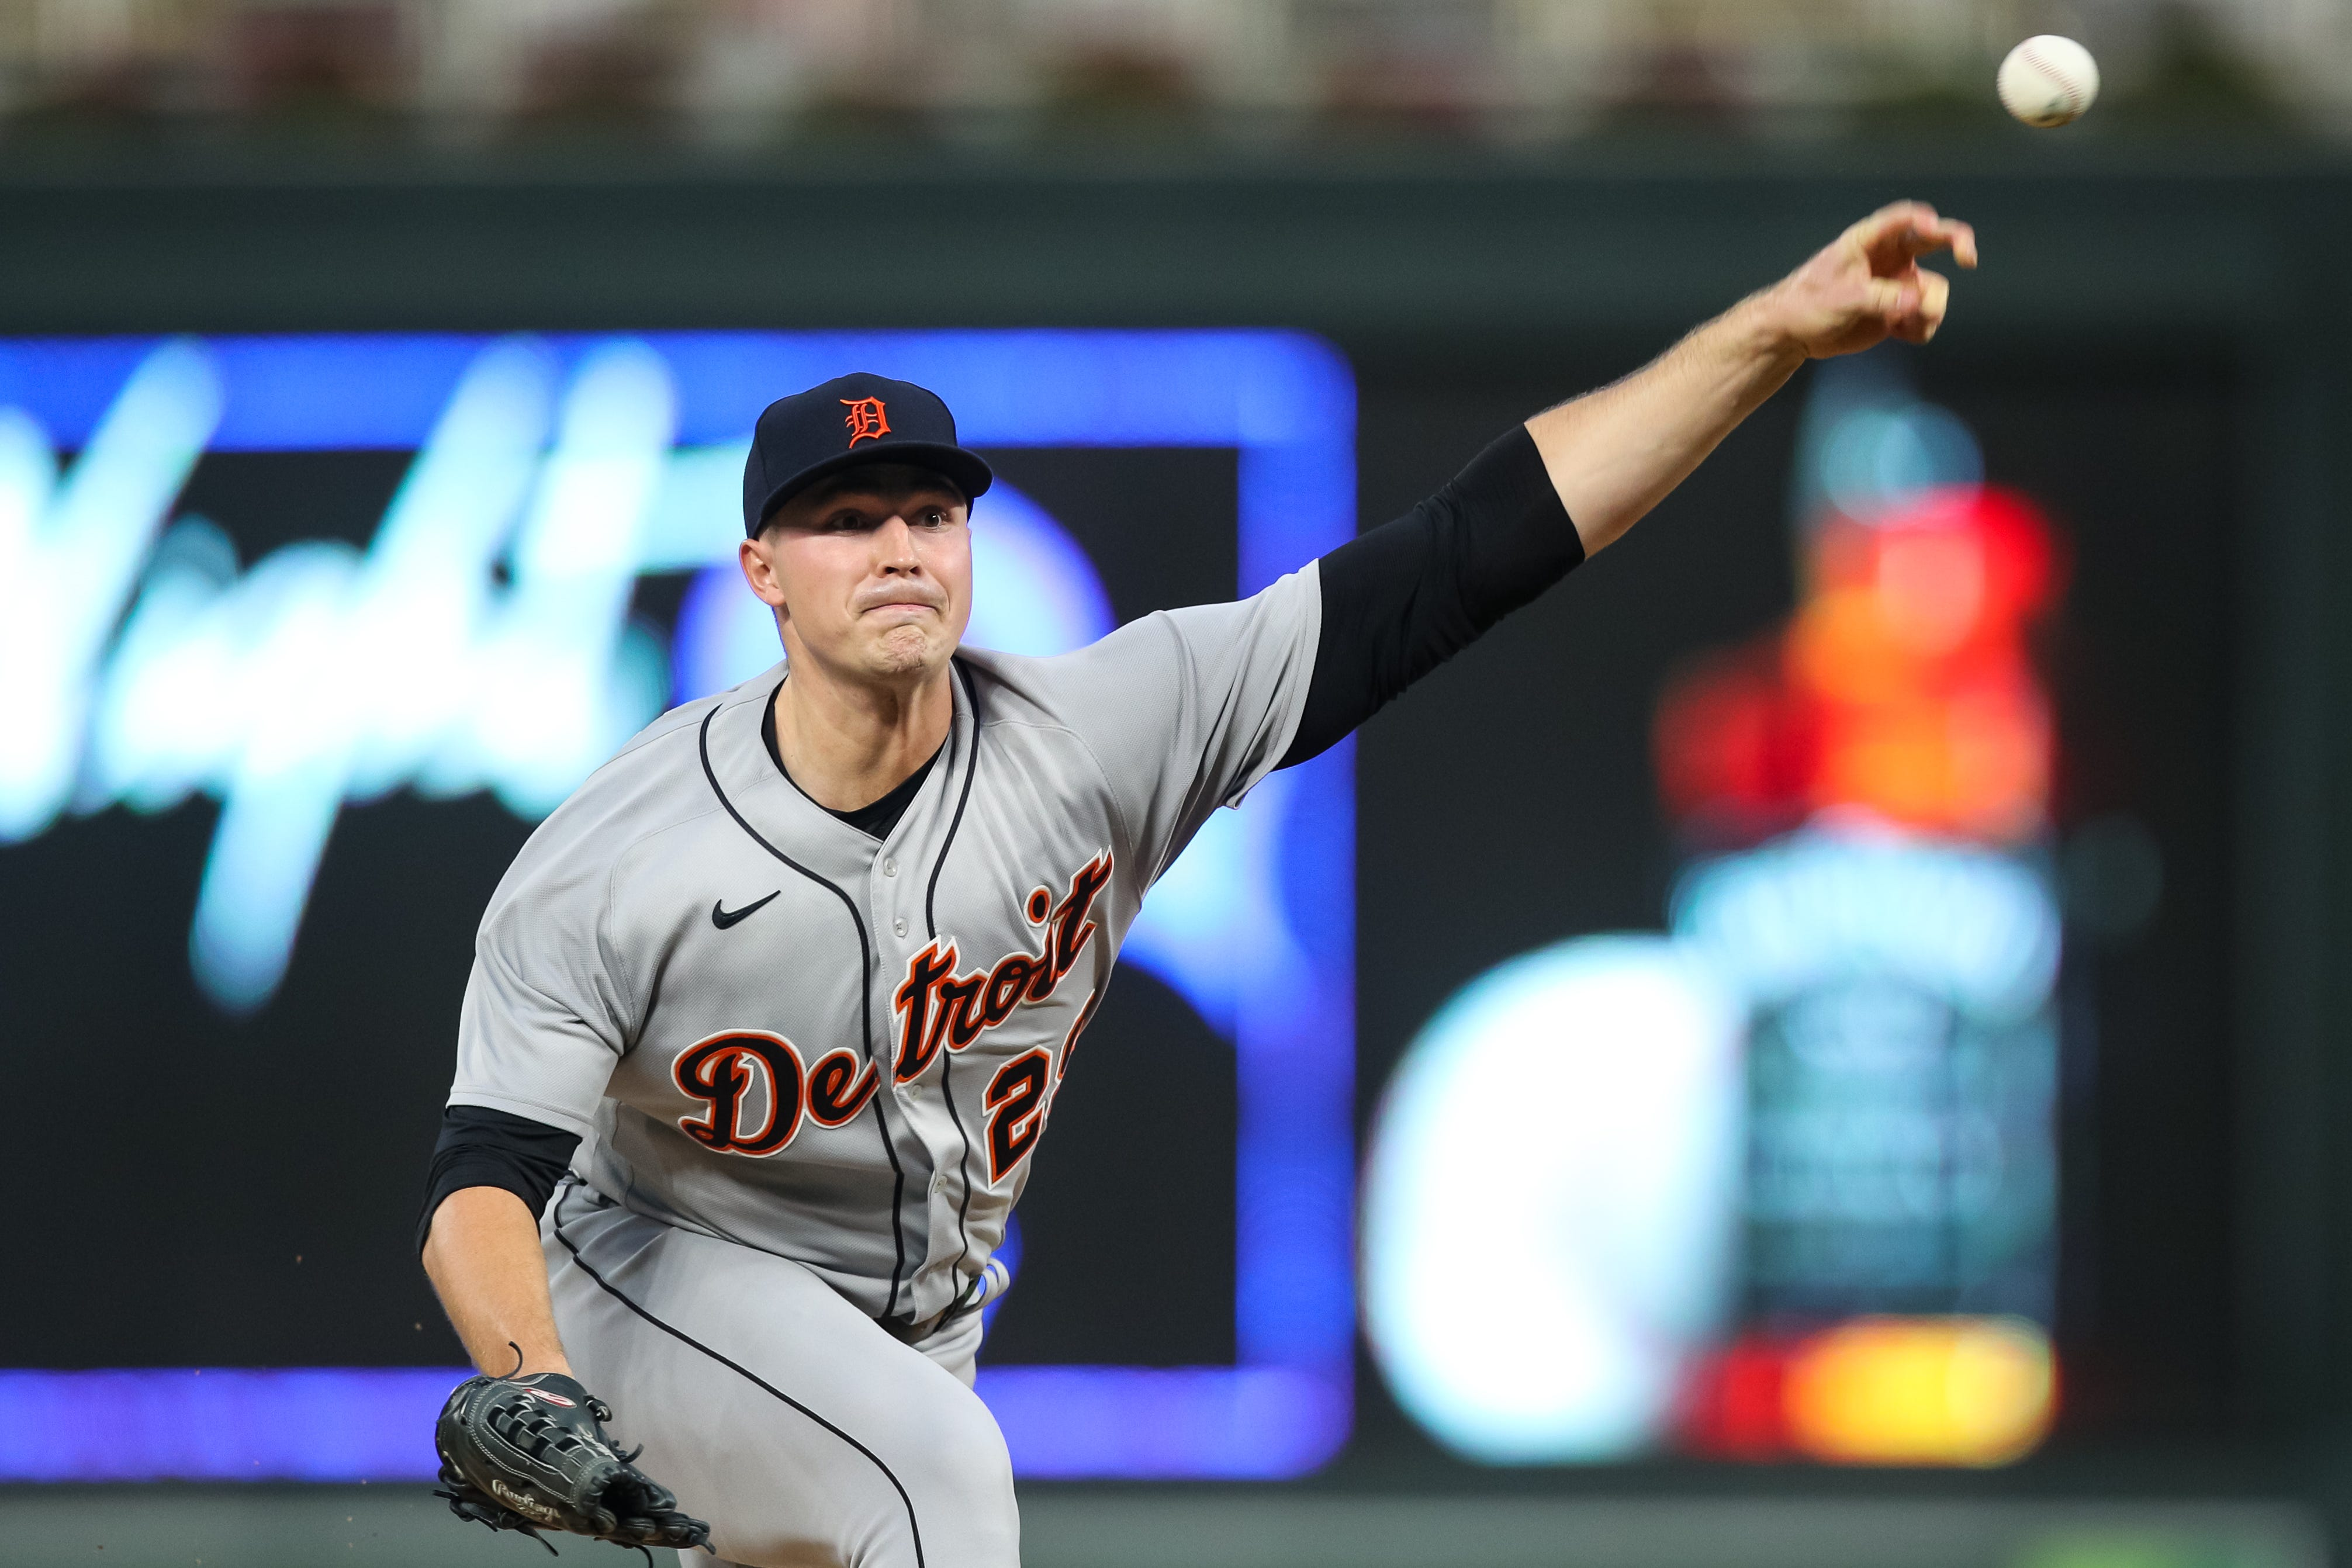 Tarik Skubal finishes season, offense grinds in Detroit Tigers' 10-7 win vs. Minnesota Twins